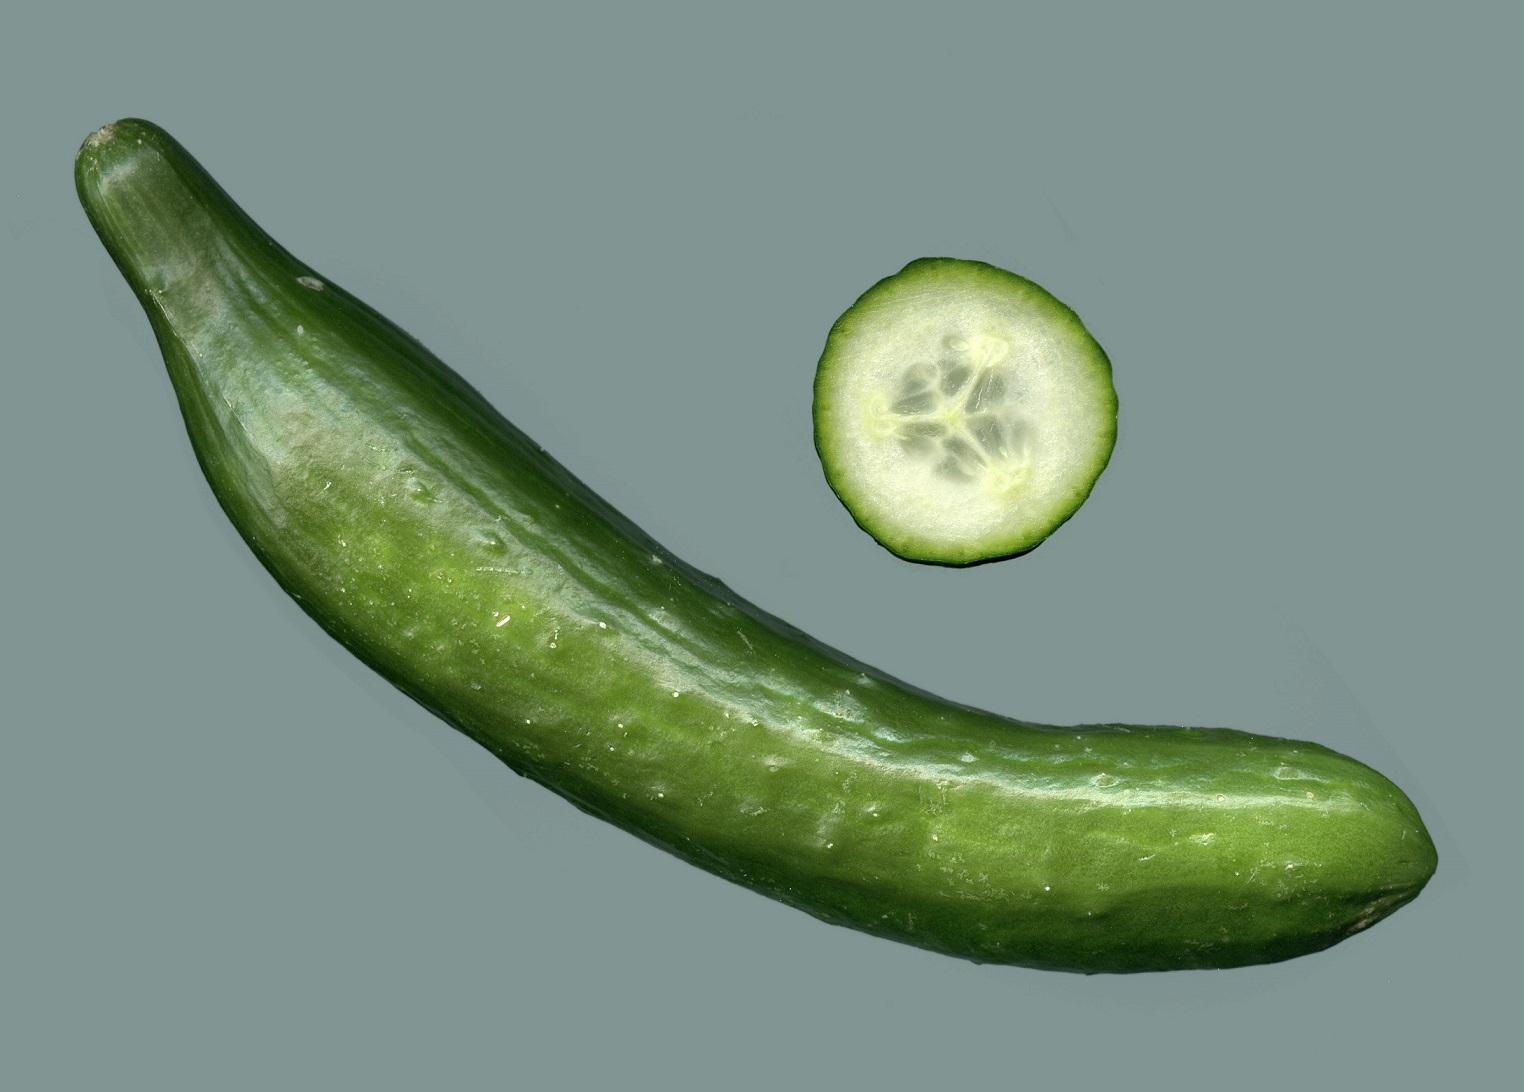 Salatgurke (Bild: Rainer Zentz, GFDL oder CC BY SA 3.0)